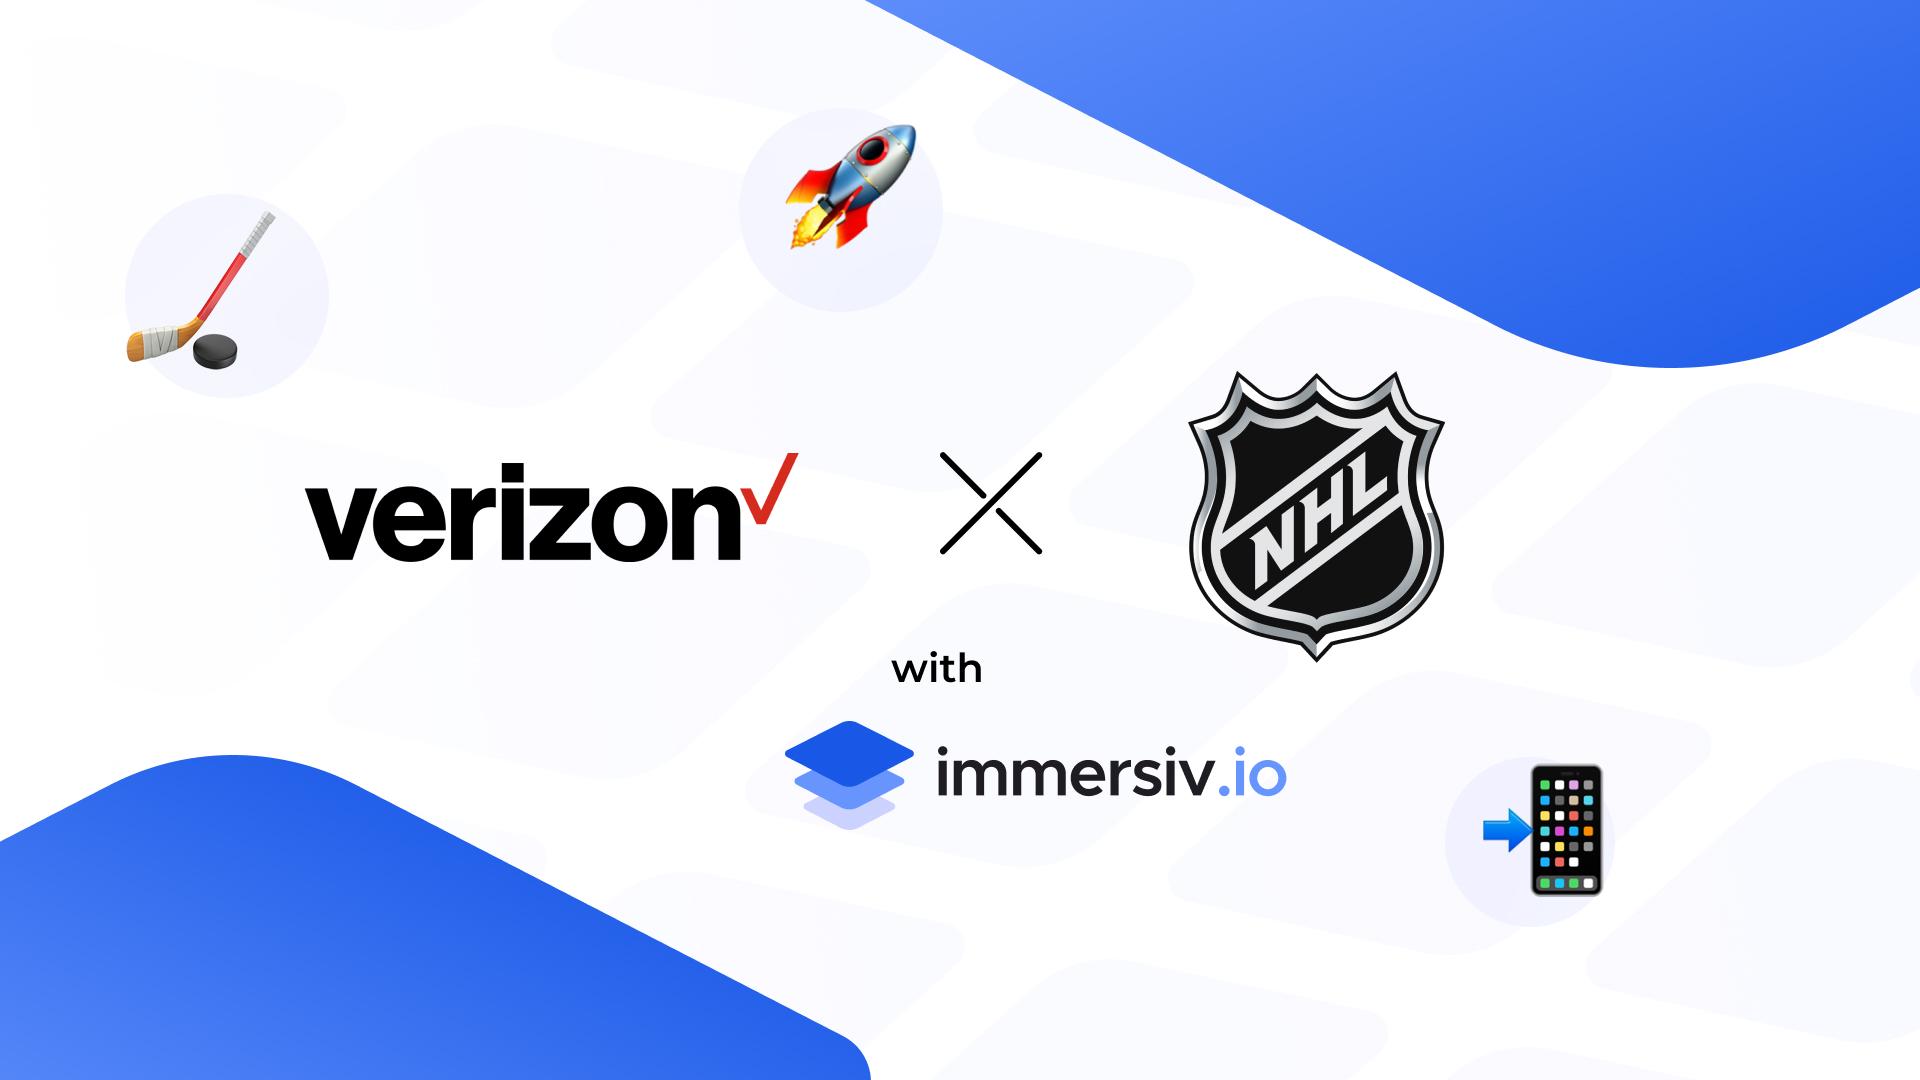 Verizon NHL 5G with Immersiv.io